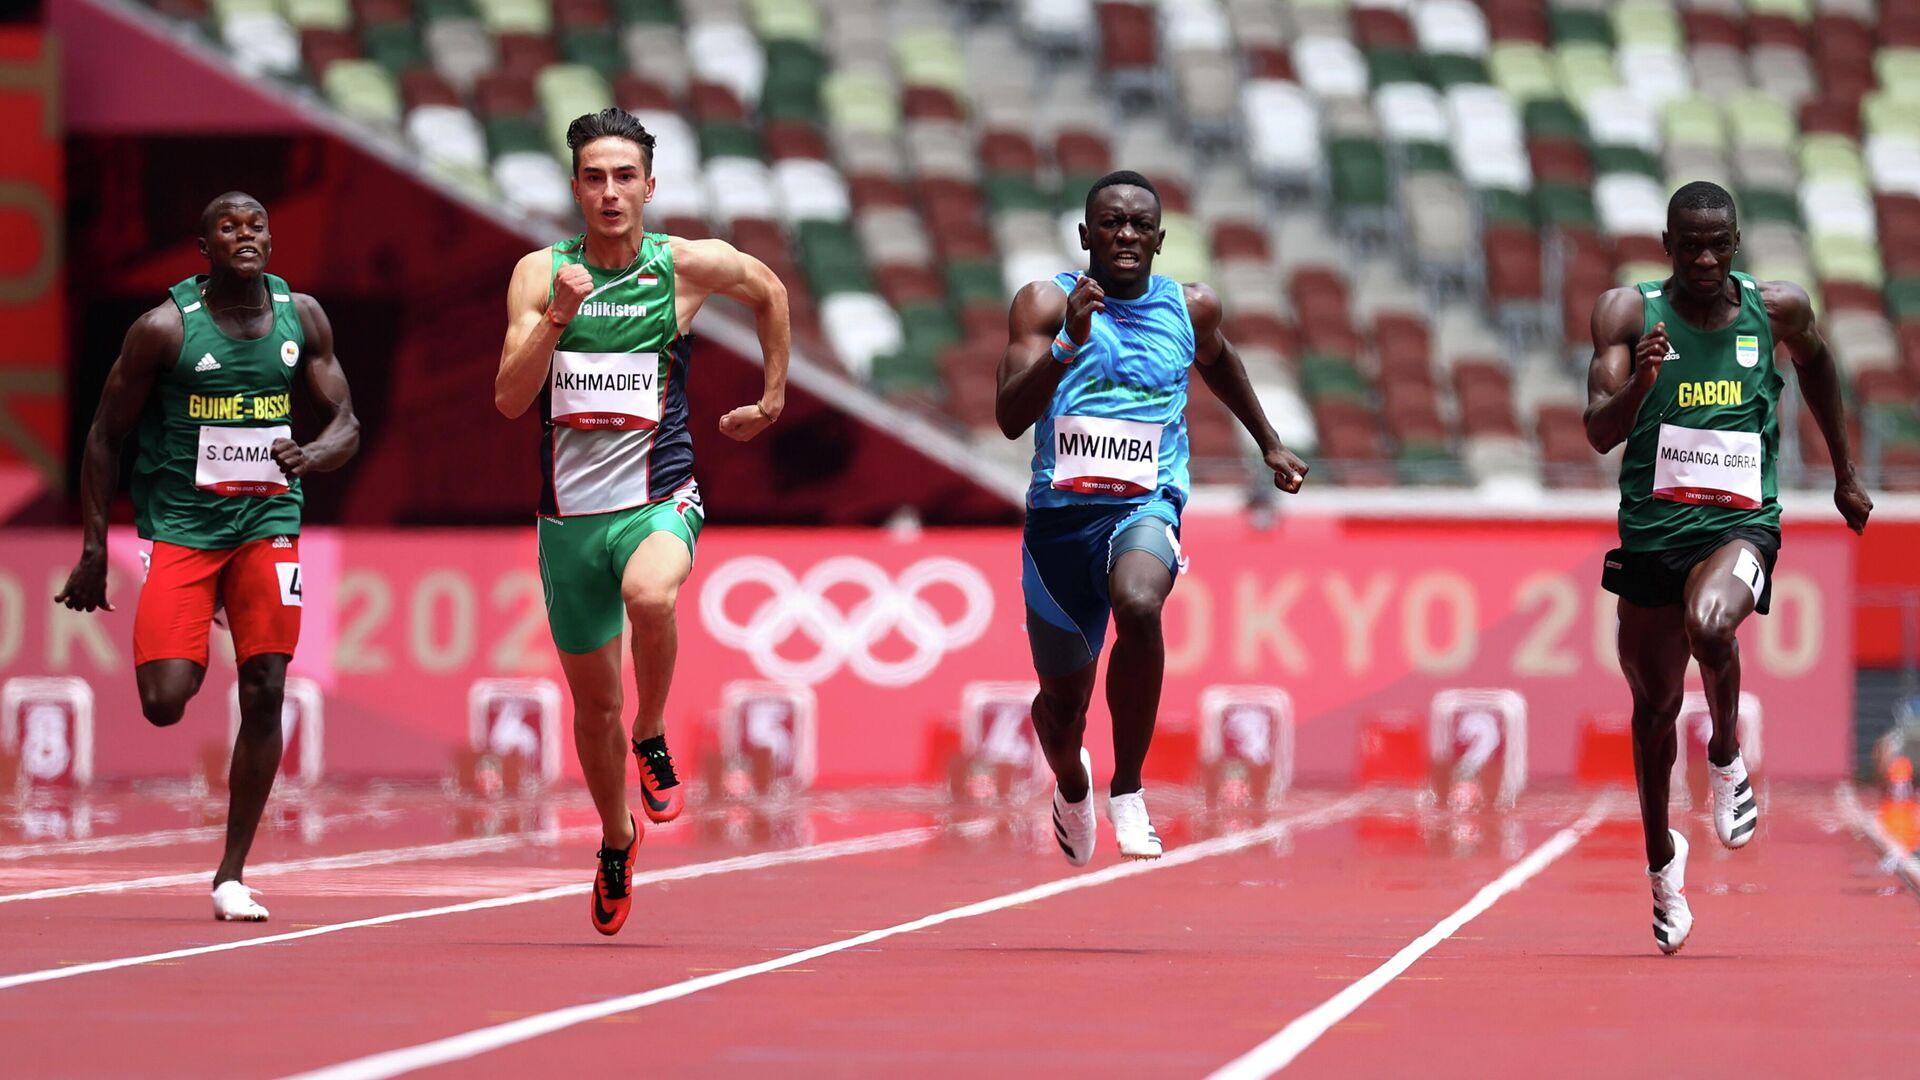 Бегун Ильдар Ахмадиев на Олимпиаде в Токио - Sputnik Таджикистан, 1920, 31.07.2021